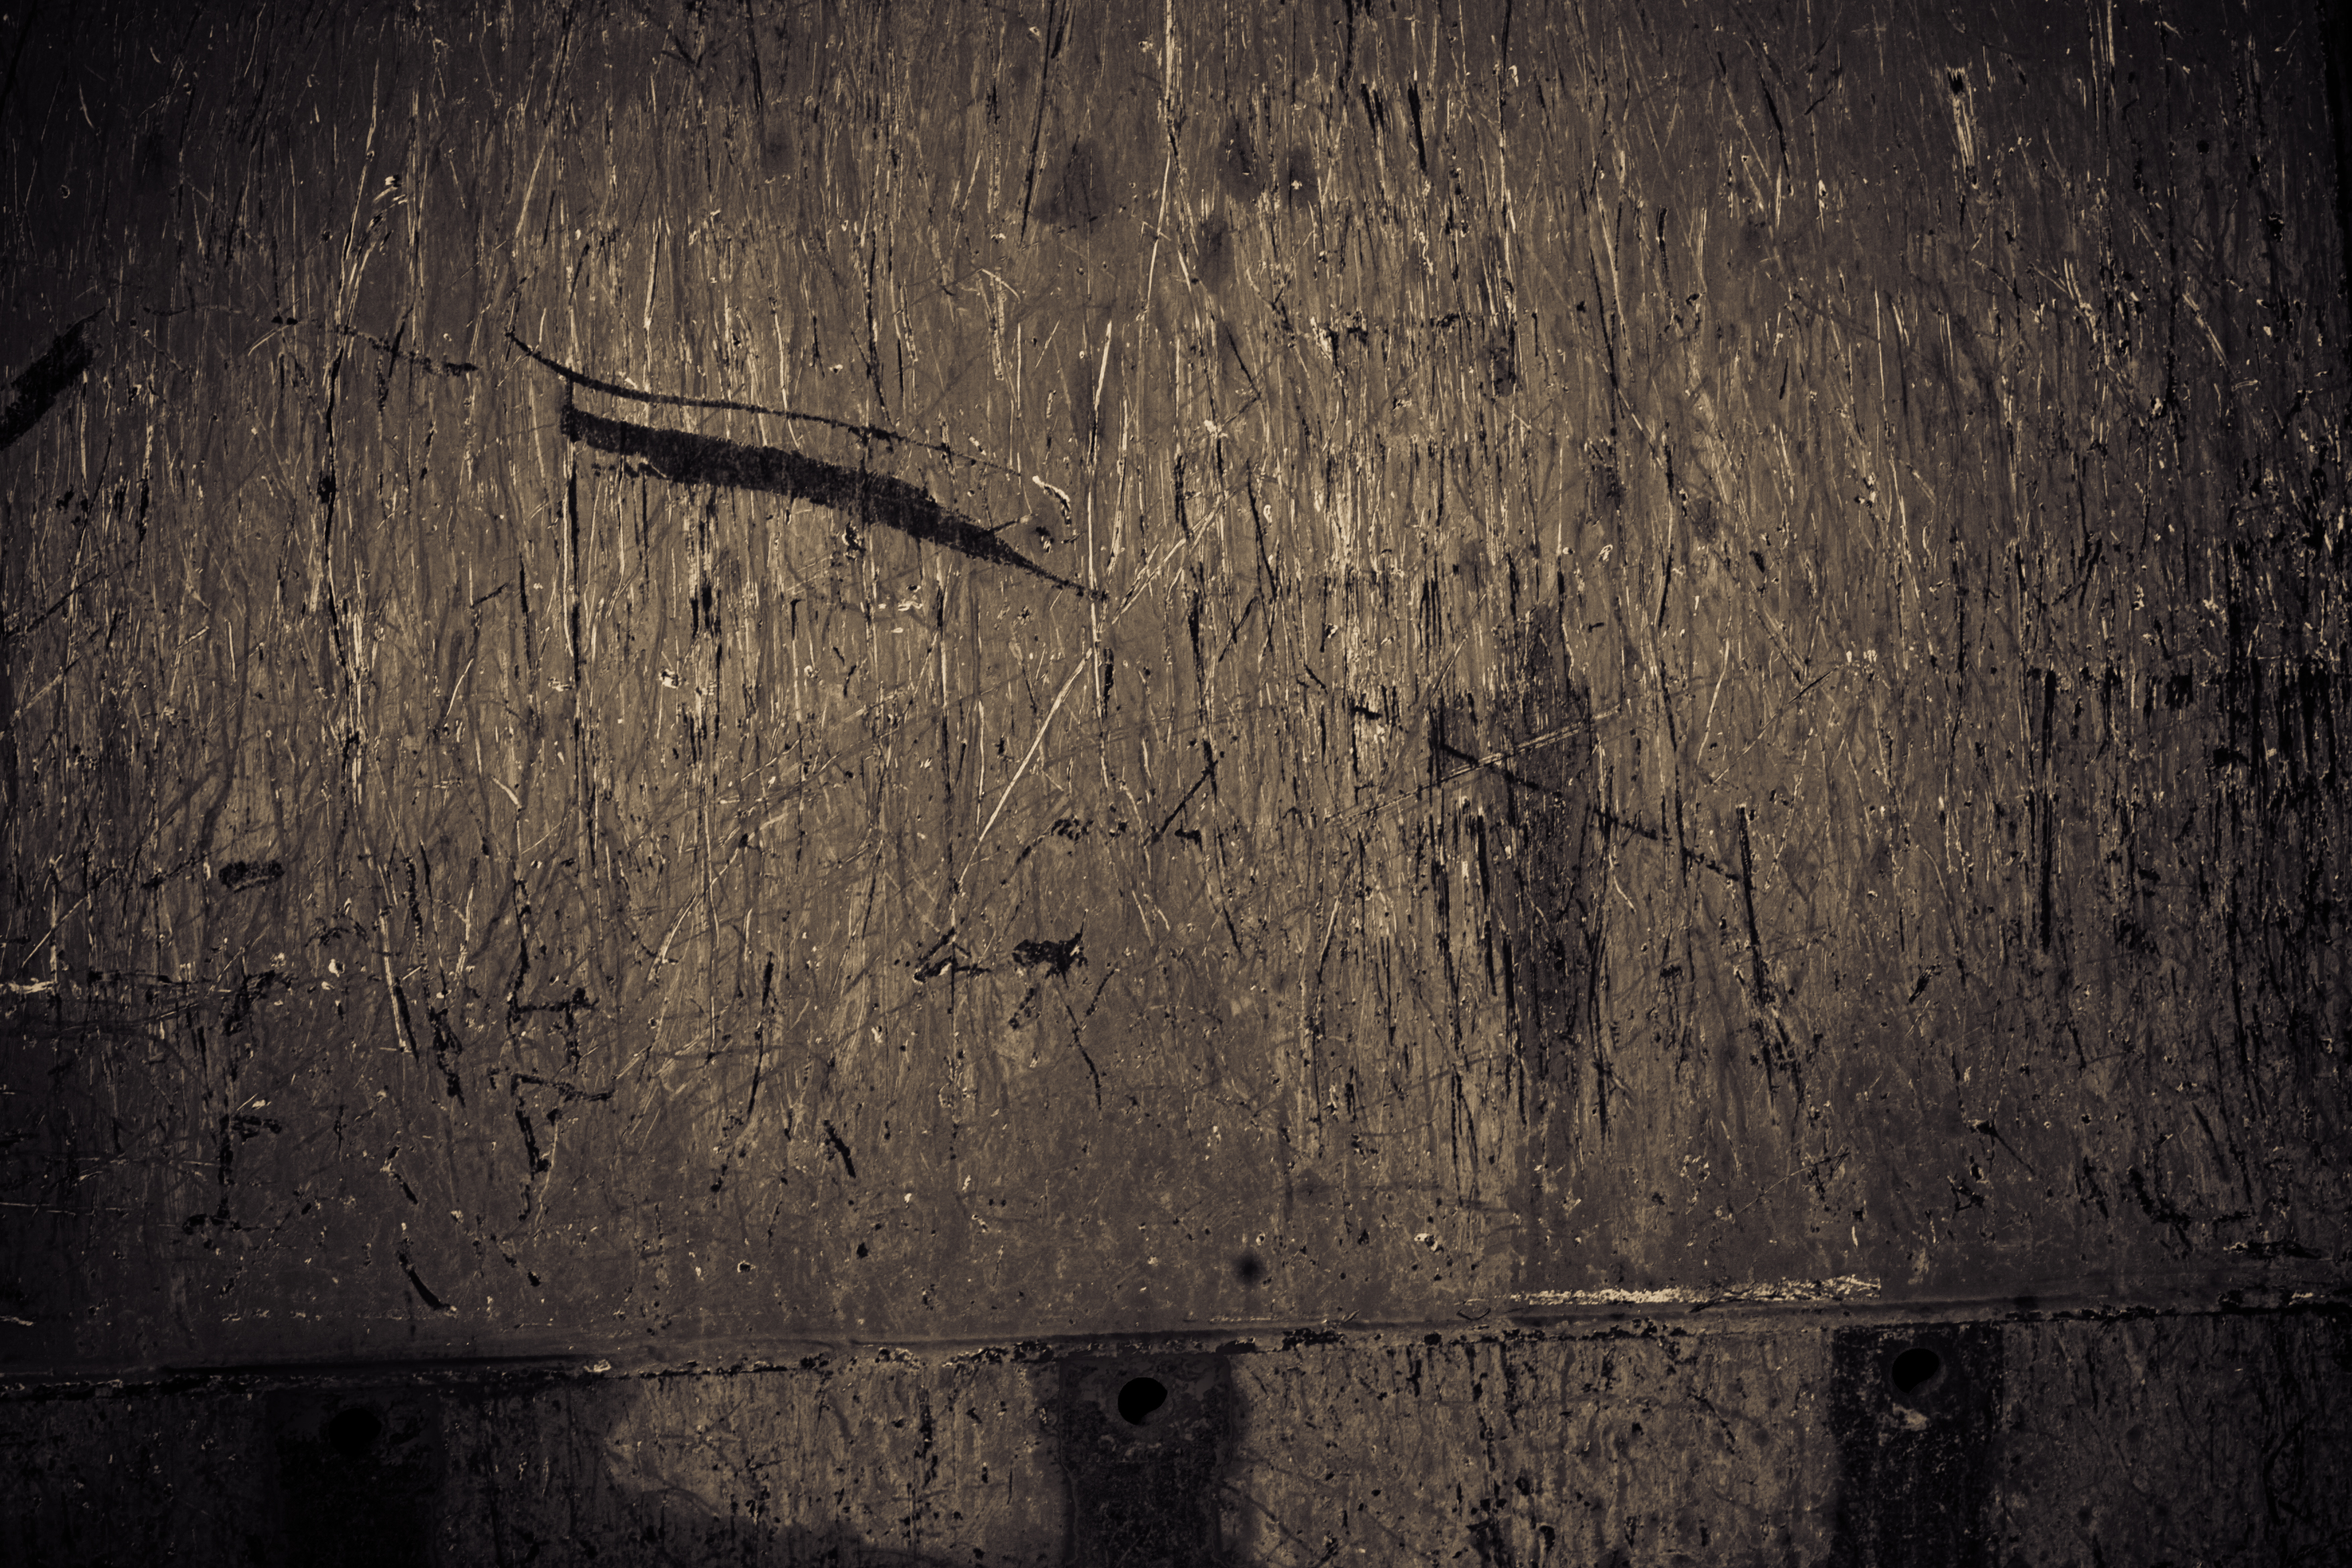 Scratched metal texture photo